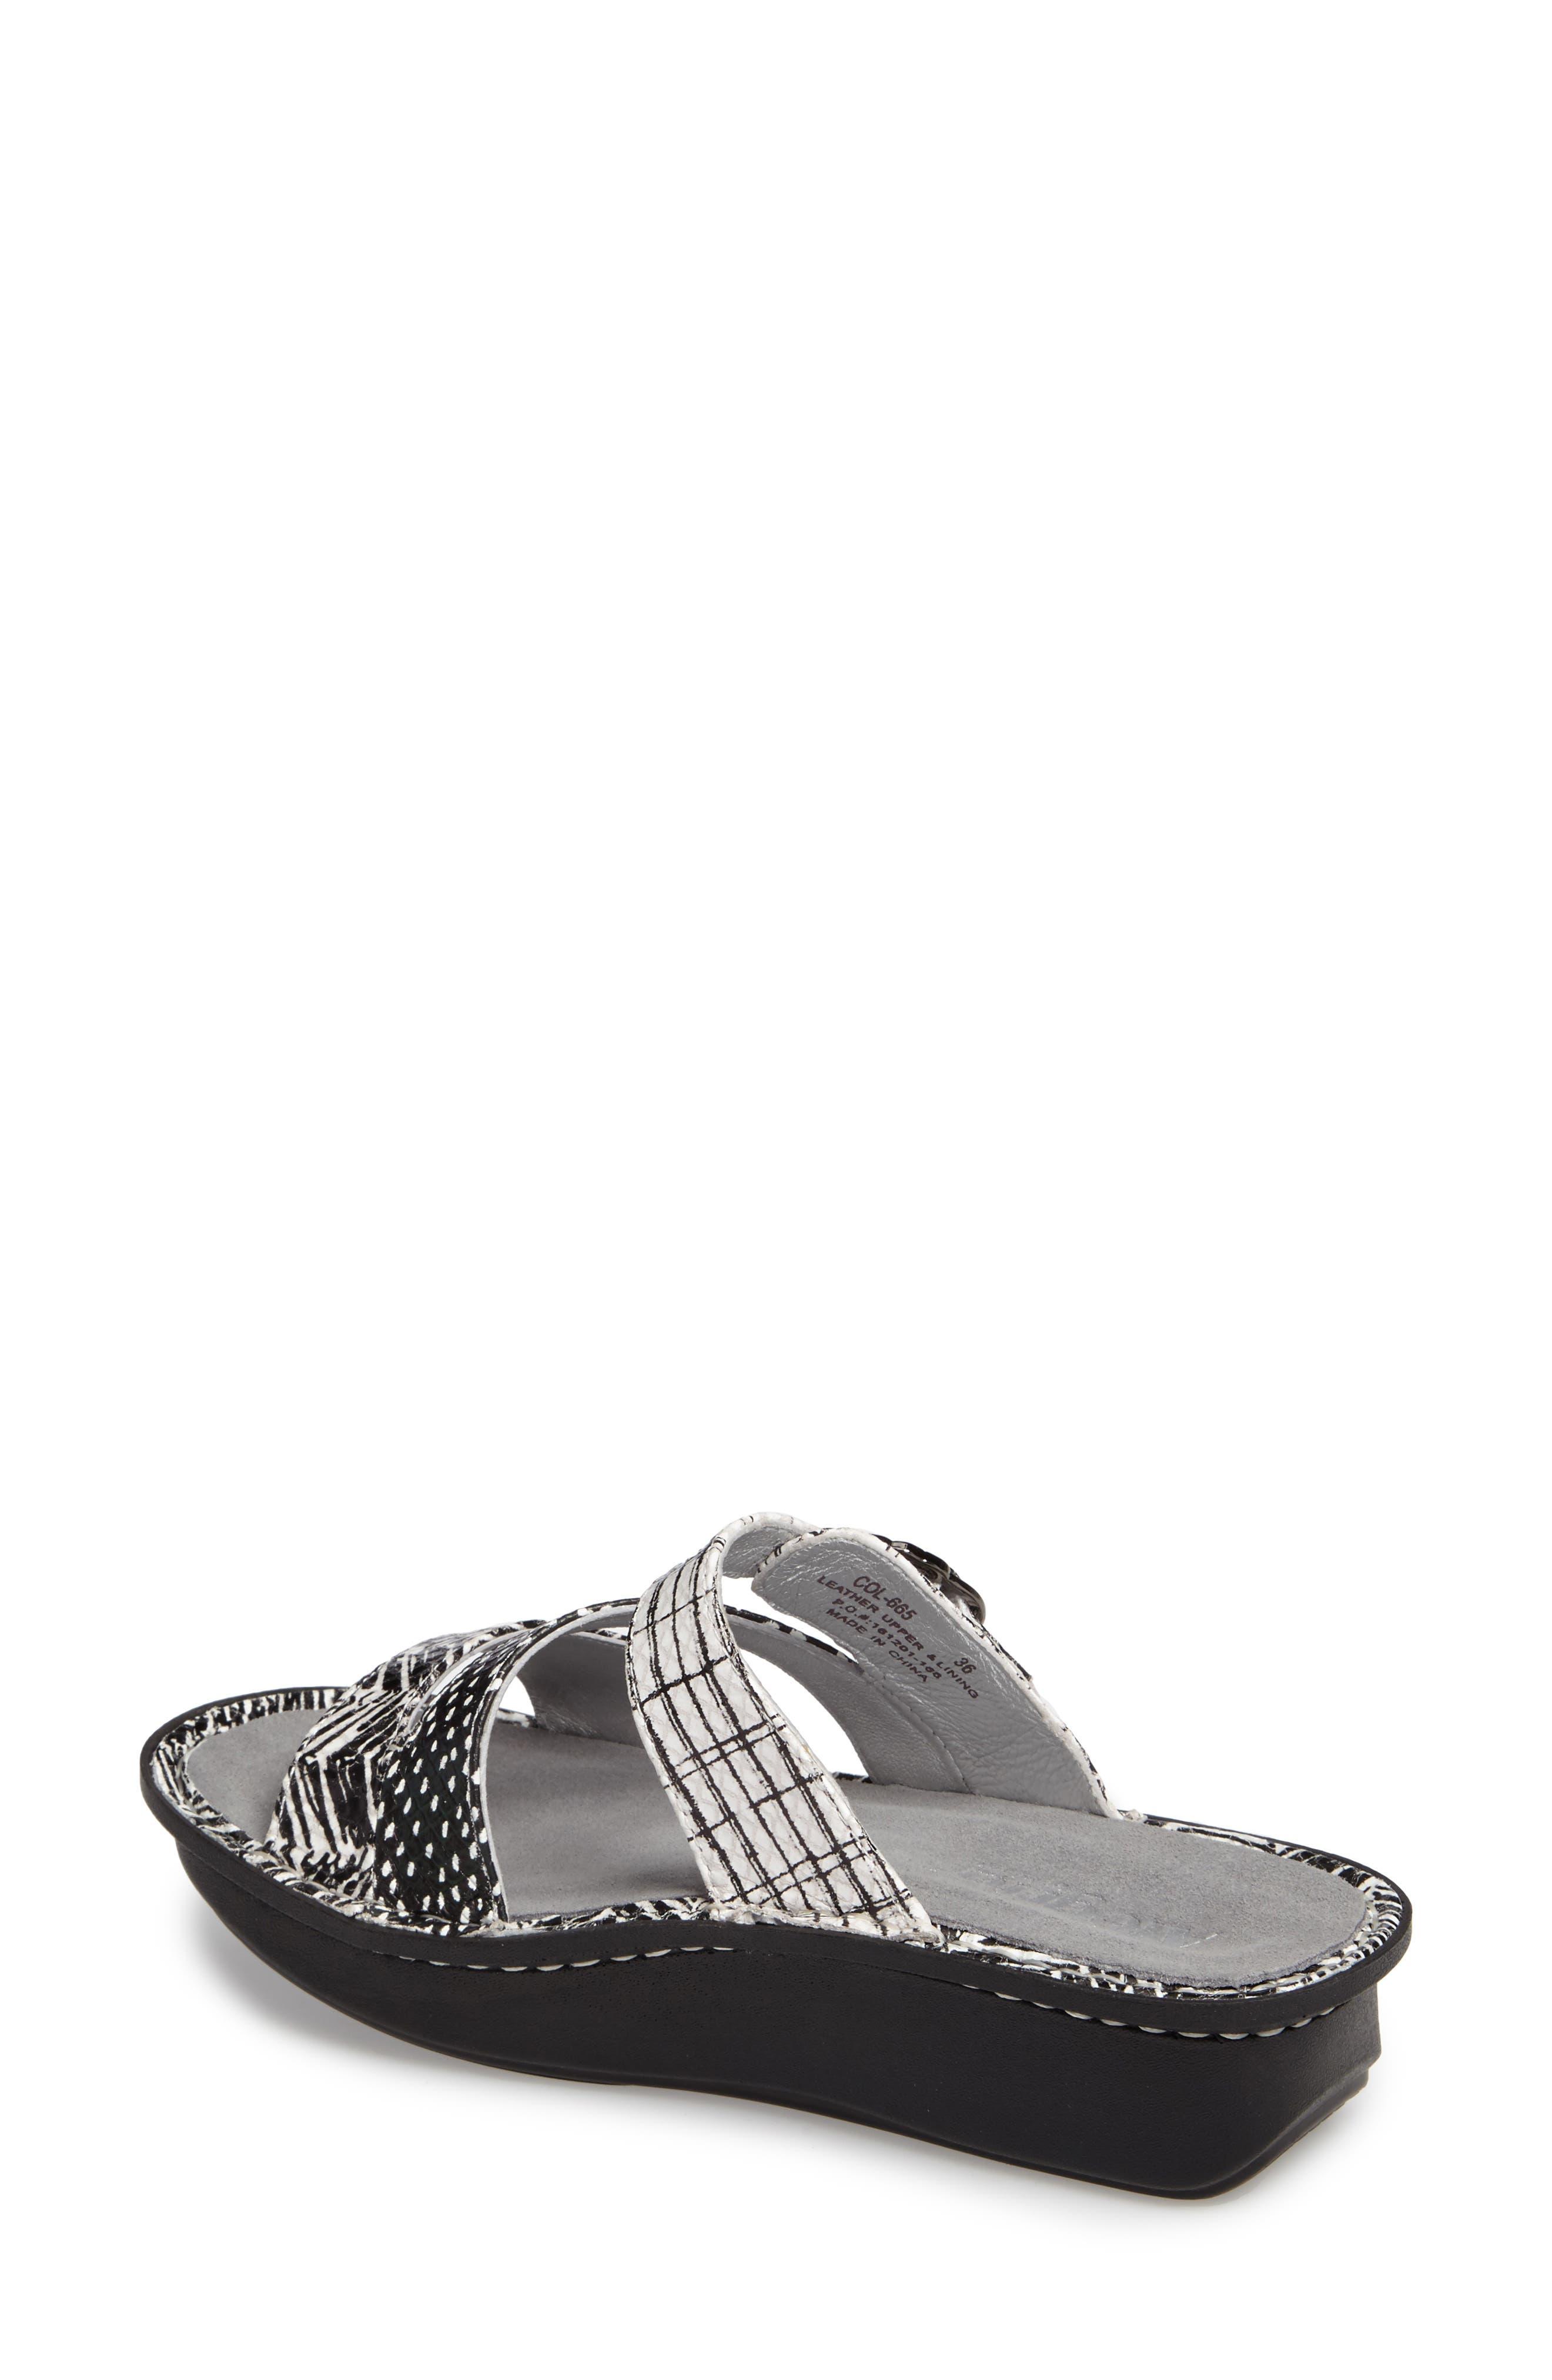 'Colette' Platform Sandal,                             Alternate thumbnail 20, color,